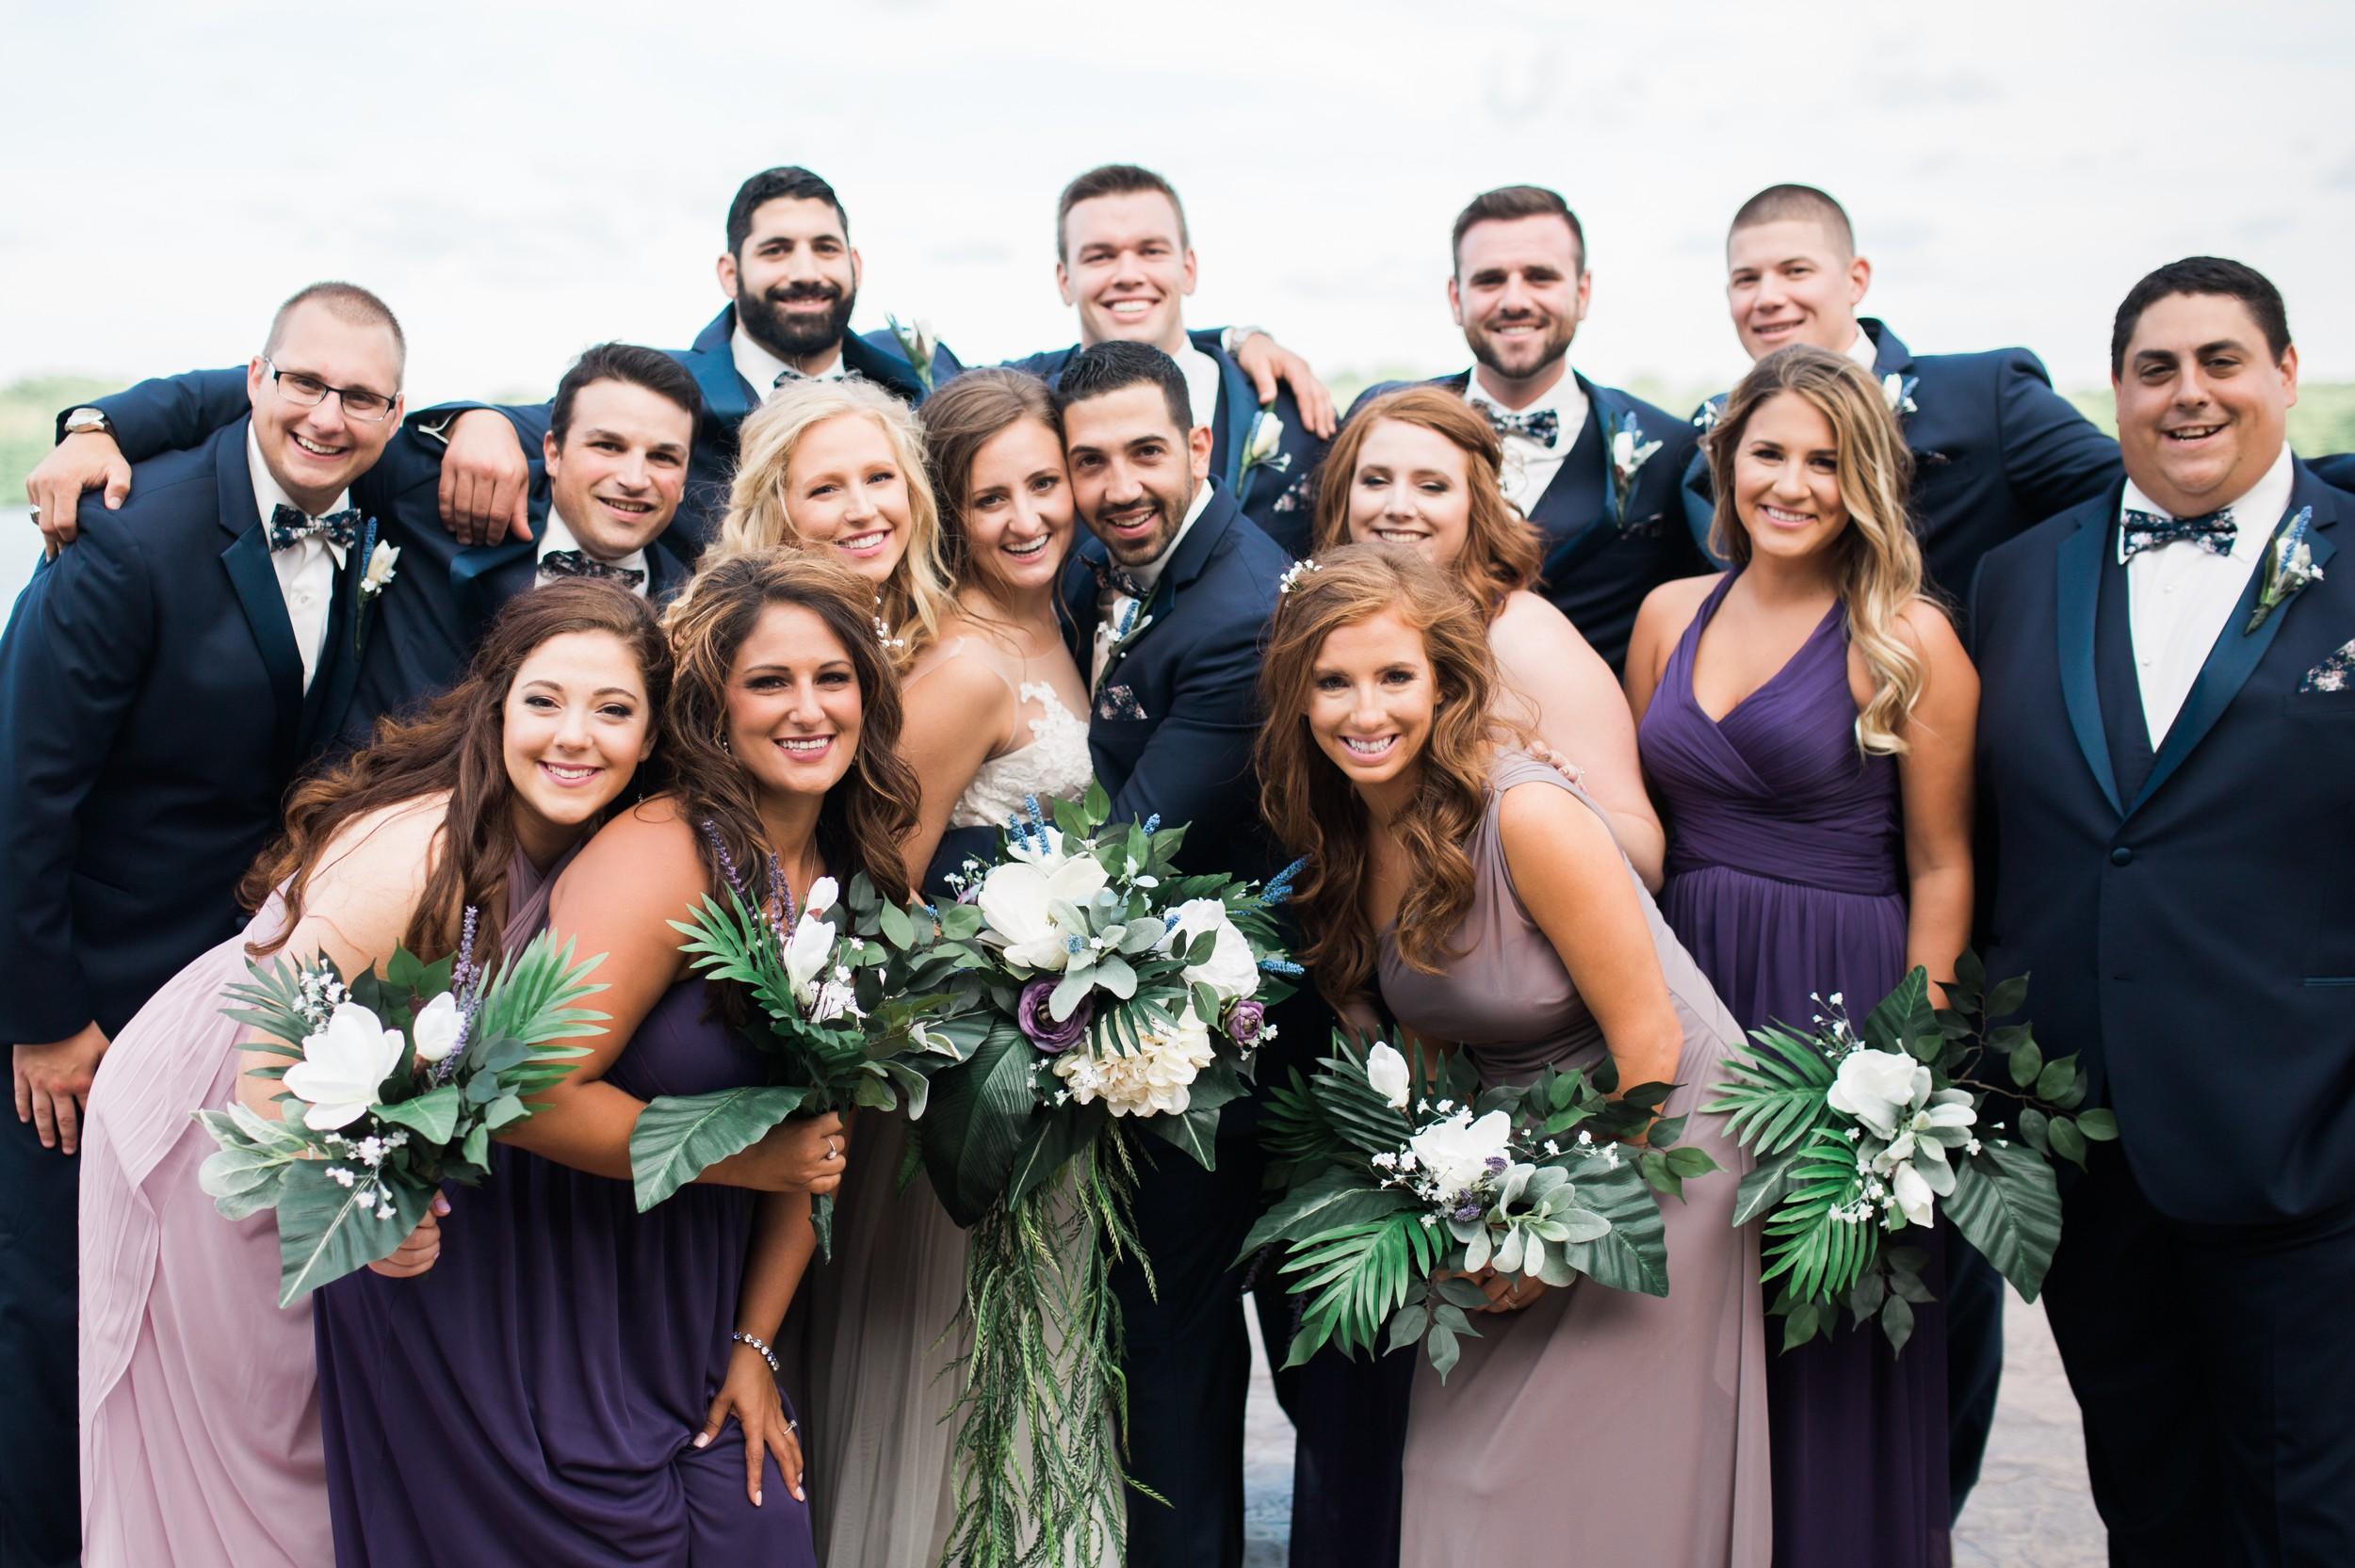 Nick-and-martina-pinelake-vinyards-wedding-columbiana-ohio-tracylynn-photography 5.jpg